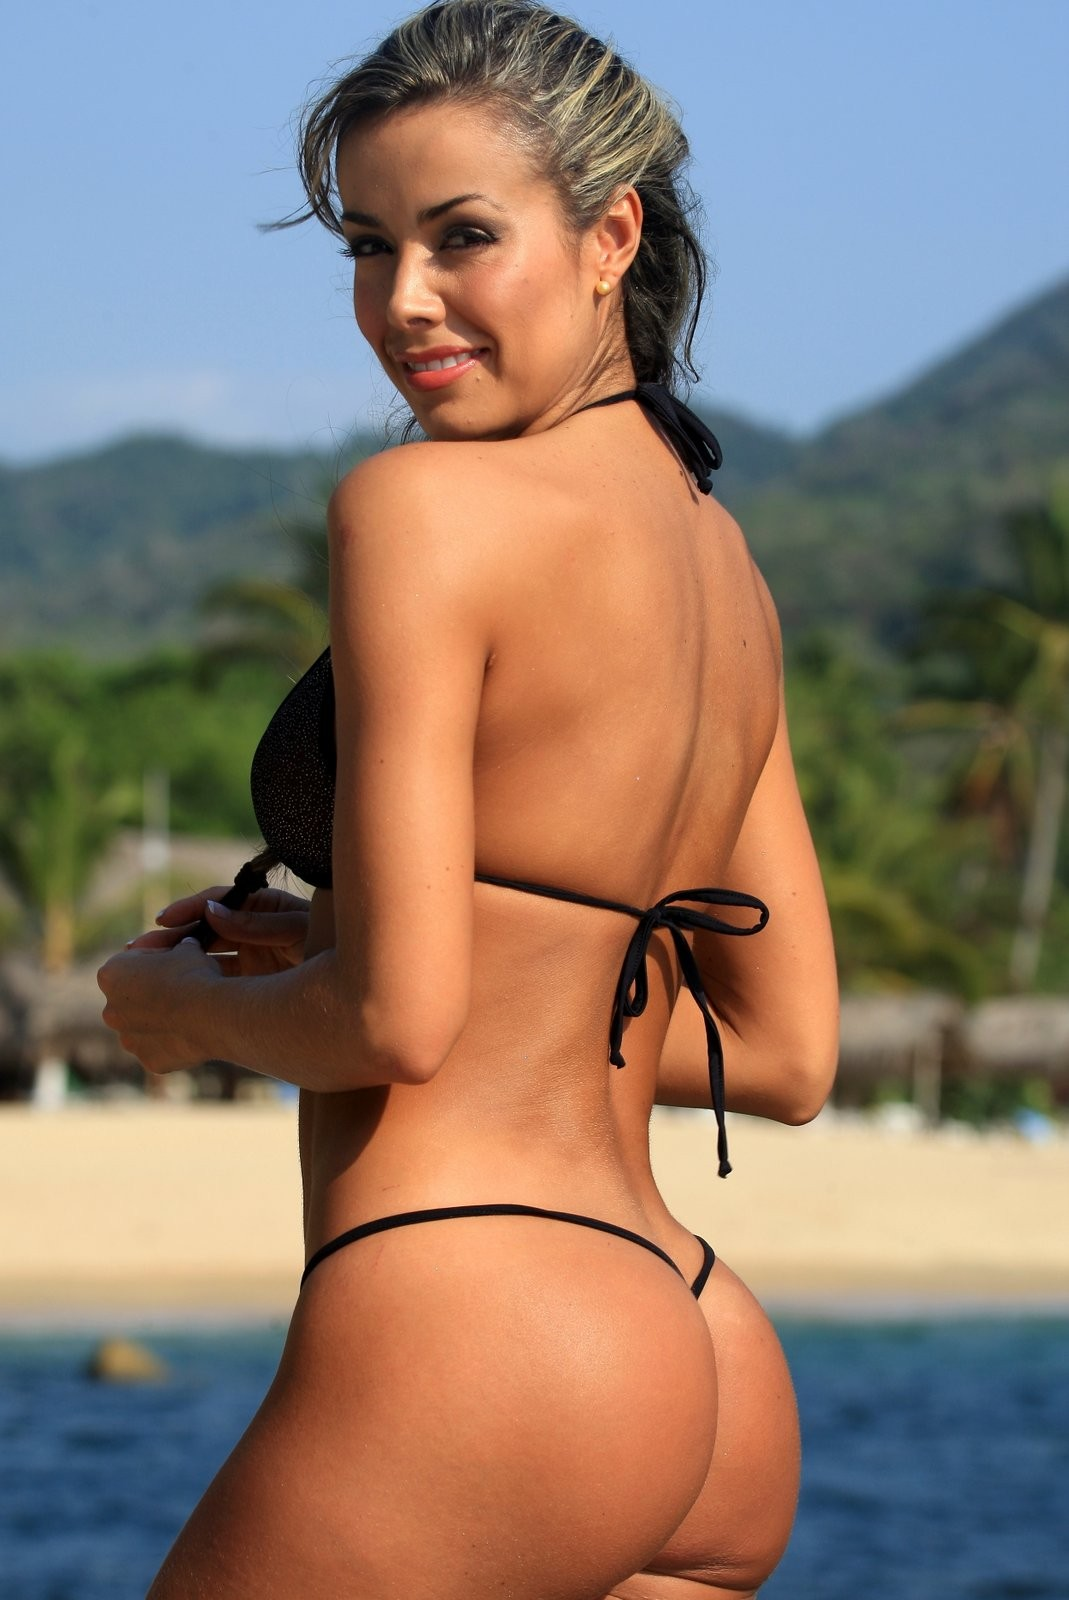 Black Sheer Sensual G-String-Bikini for a Romantic Evening for Two